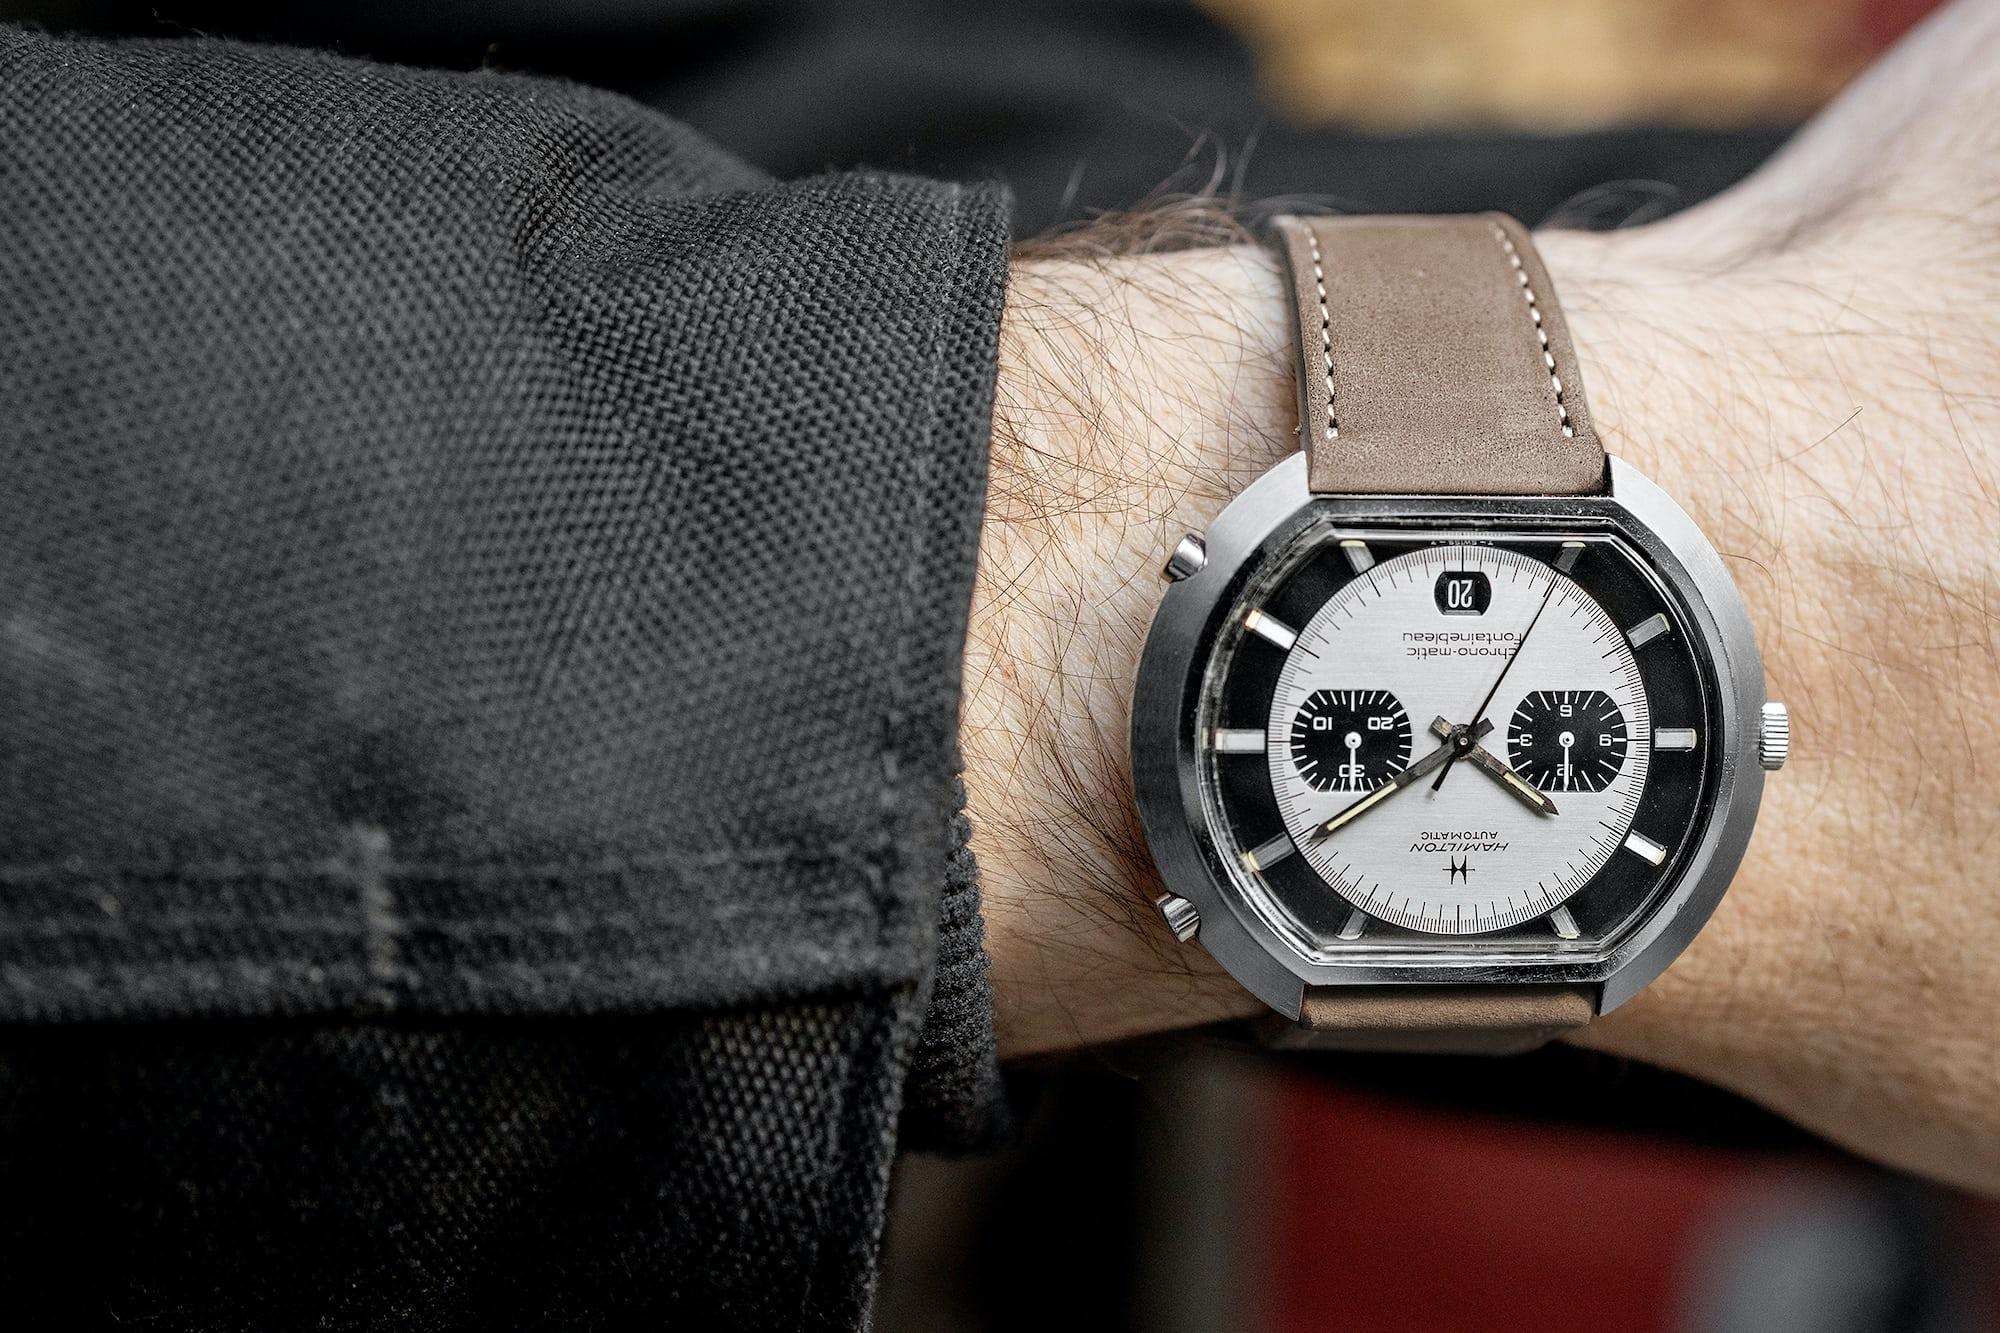 "<p><a href=""https://shop.hodinkee.com/products/1970s-hamilton-fontainebleau-ref-11001-4"" rel=""noopener"" target=""_blank""><u>1970s Hamilton Chrono-Matic Fontainebleau Ref. 11001-3</u></a></p>"